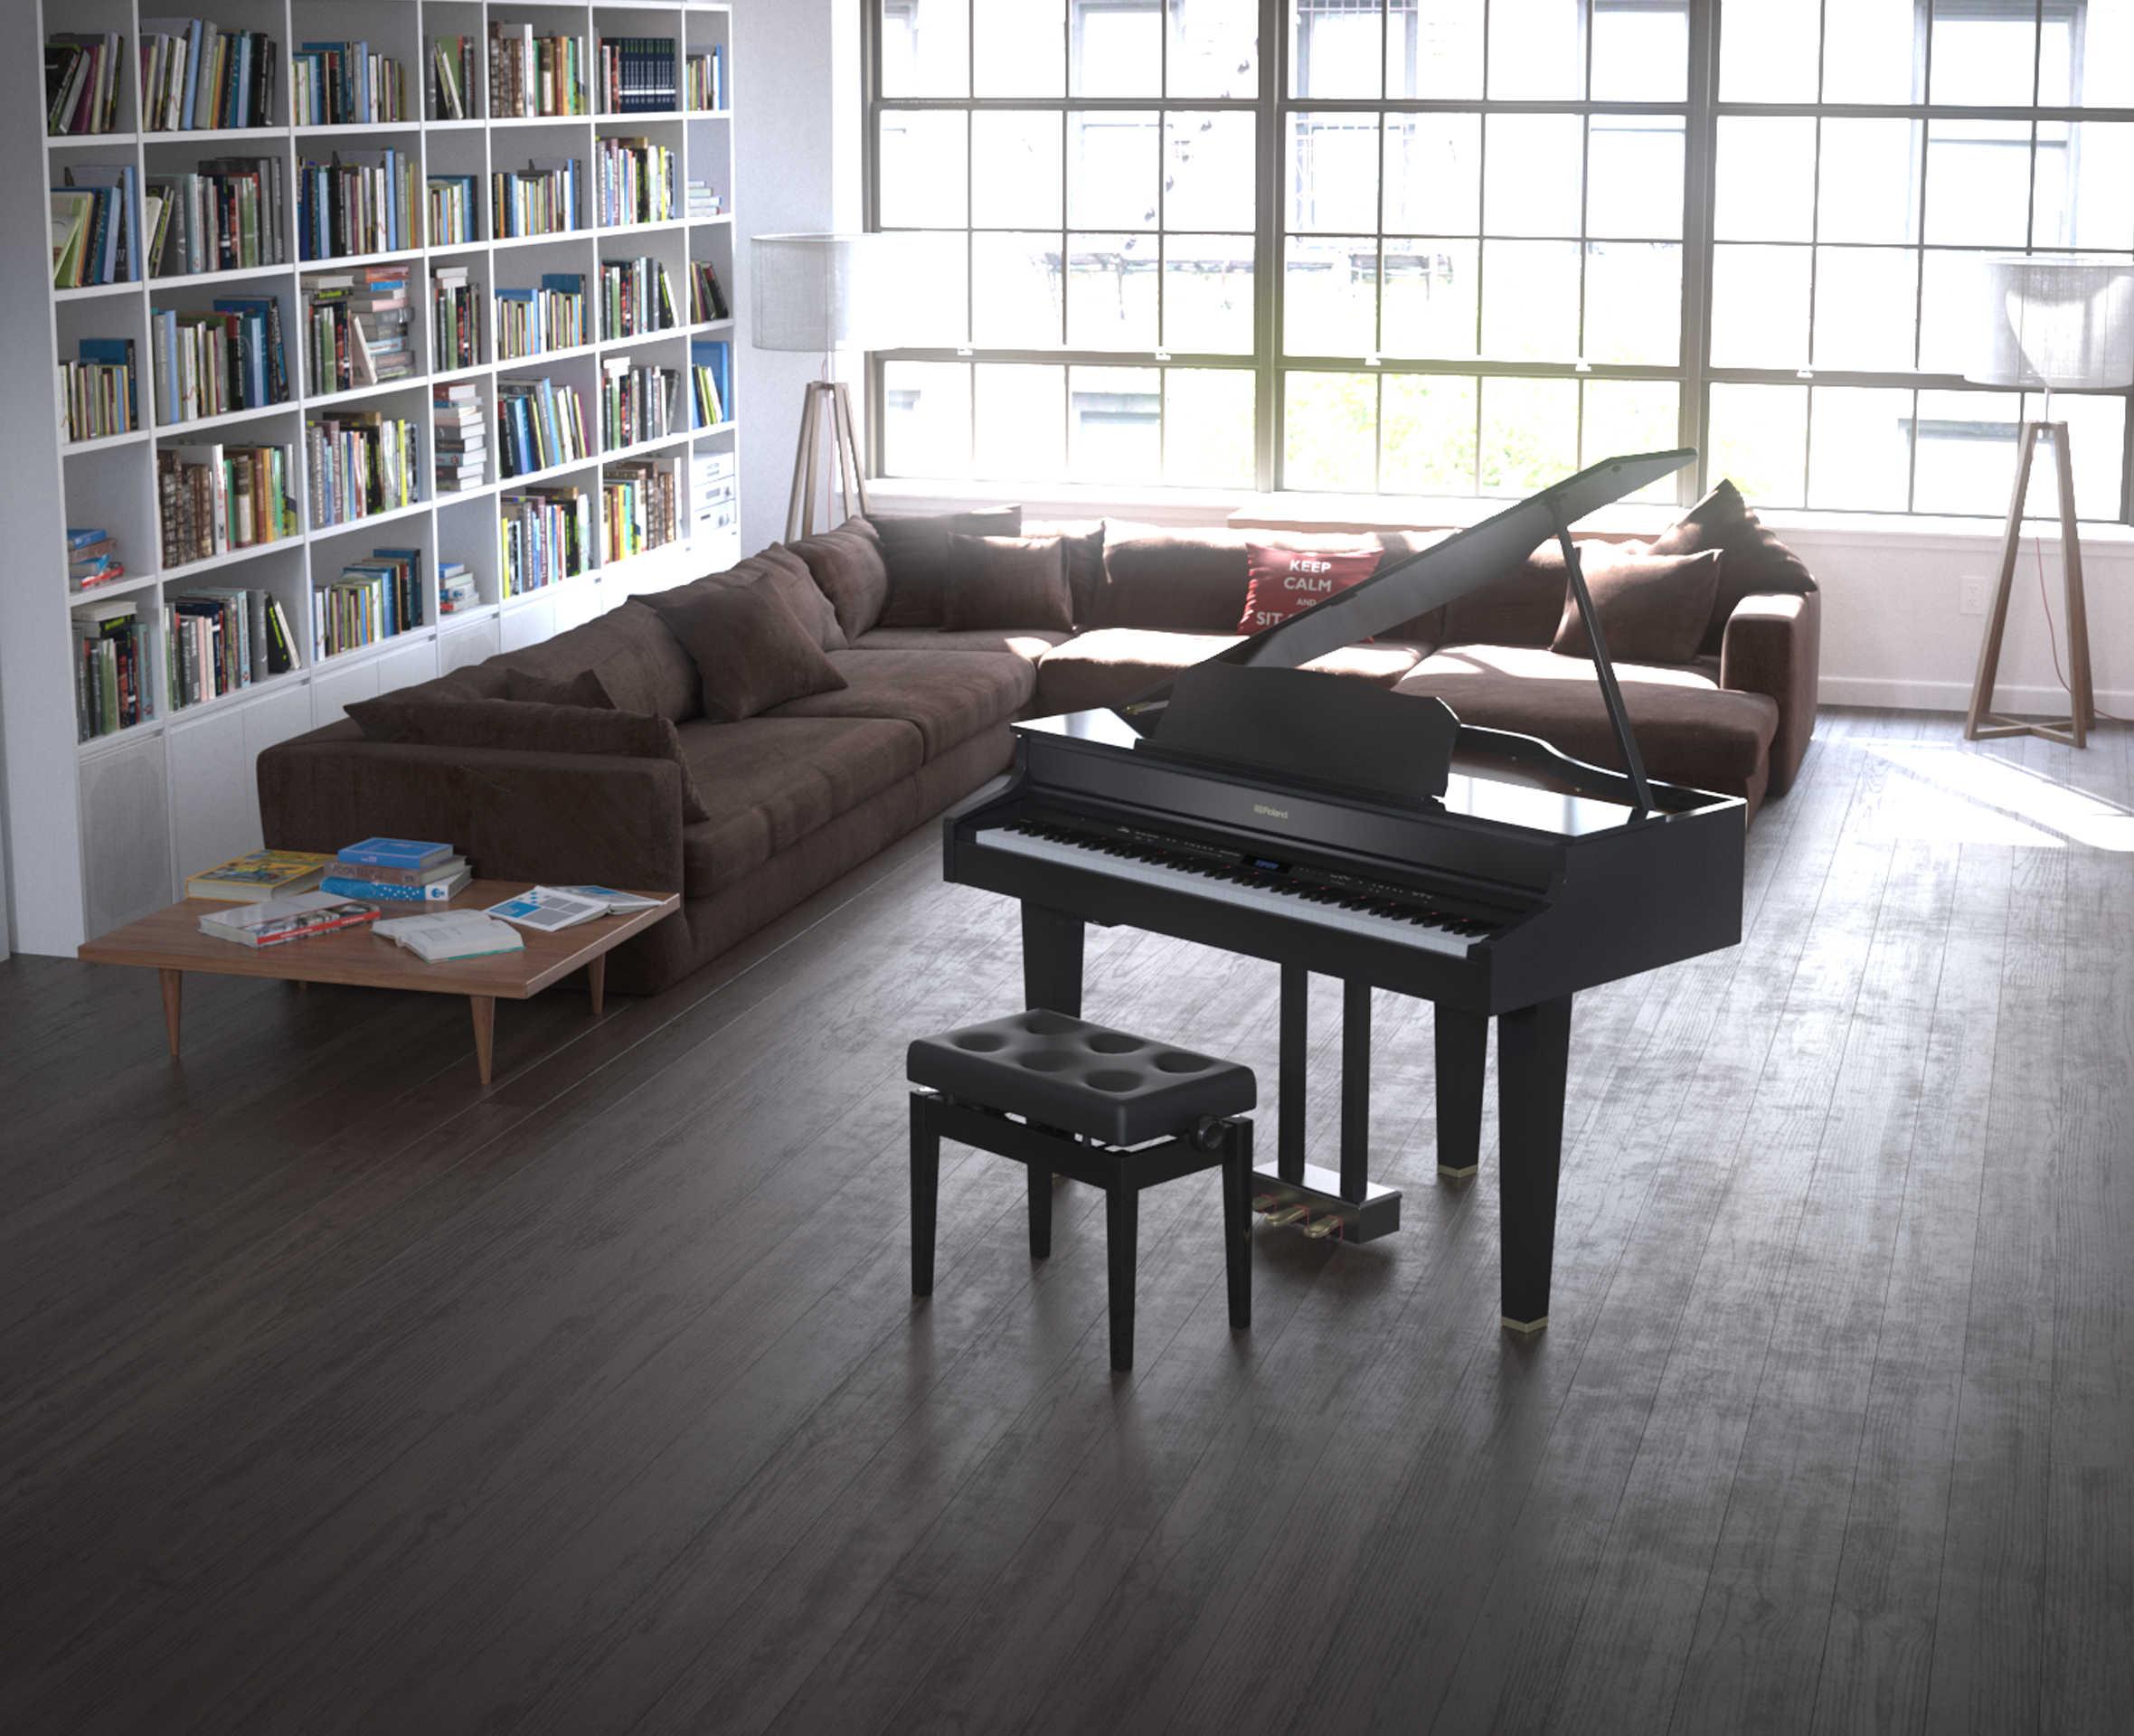 Lx-607 black grand in a room